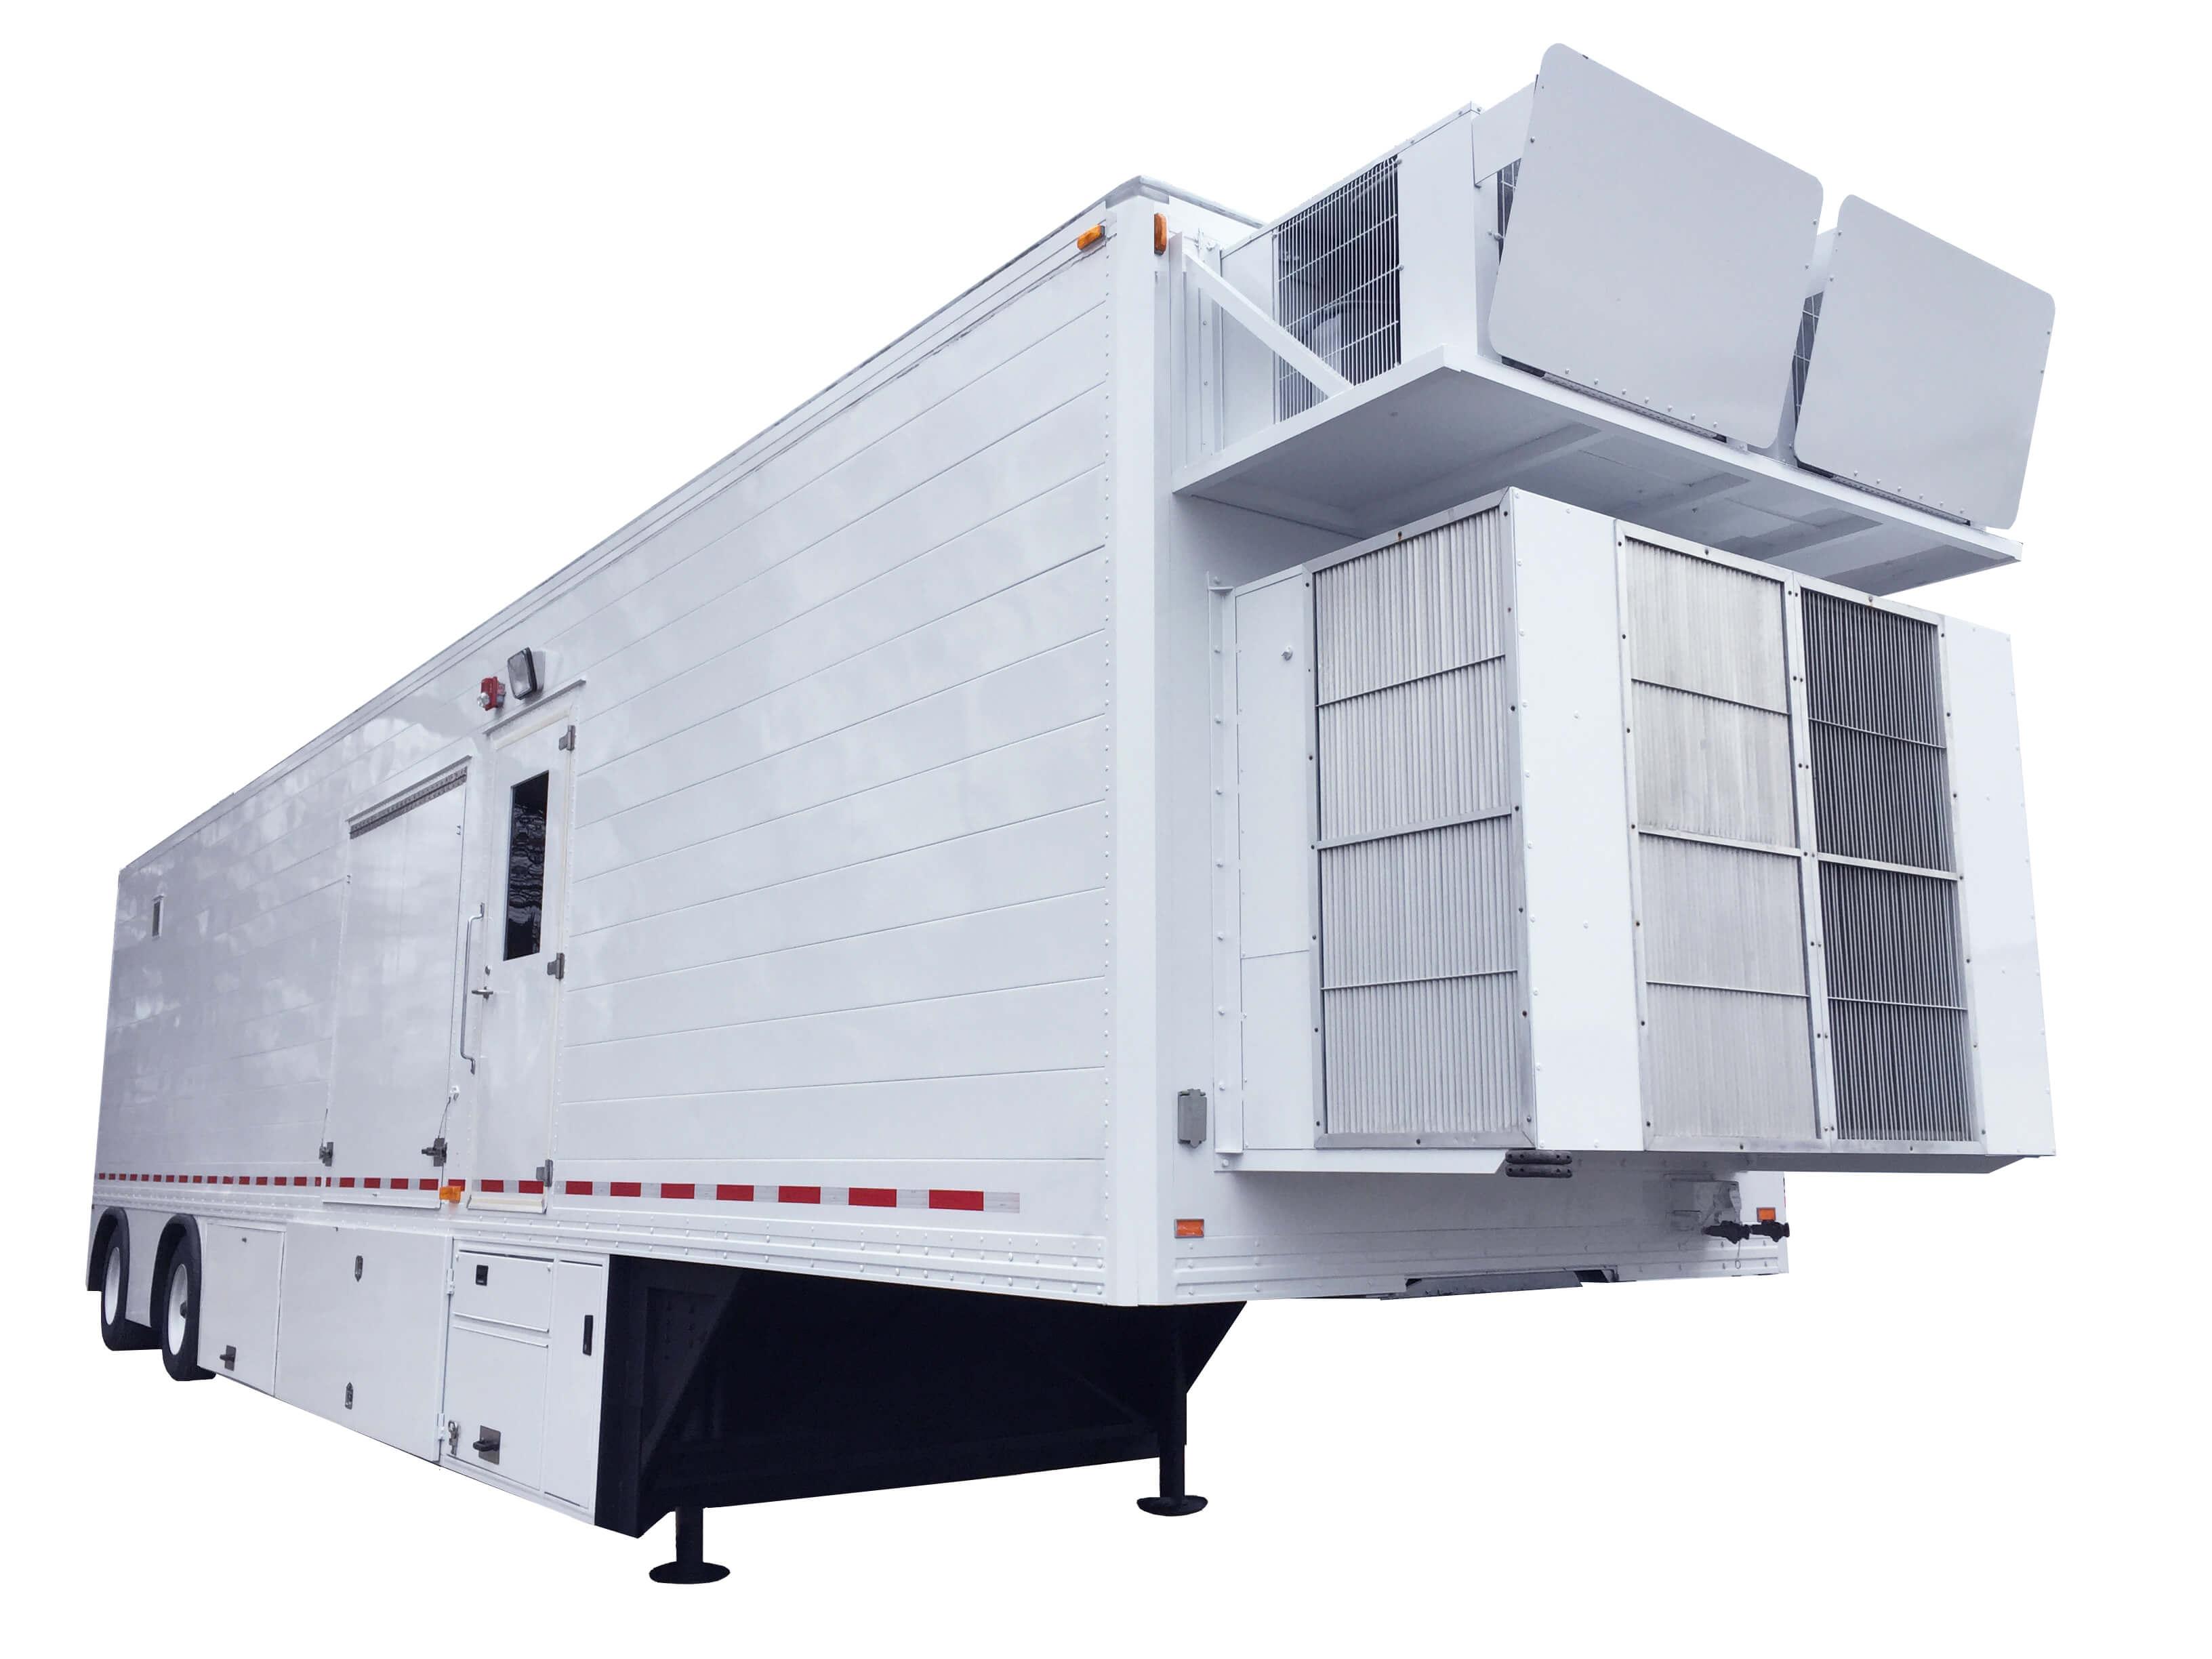 Mobile MRI Rental - Portable MRI Machine